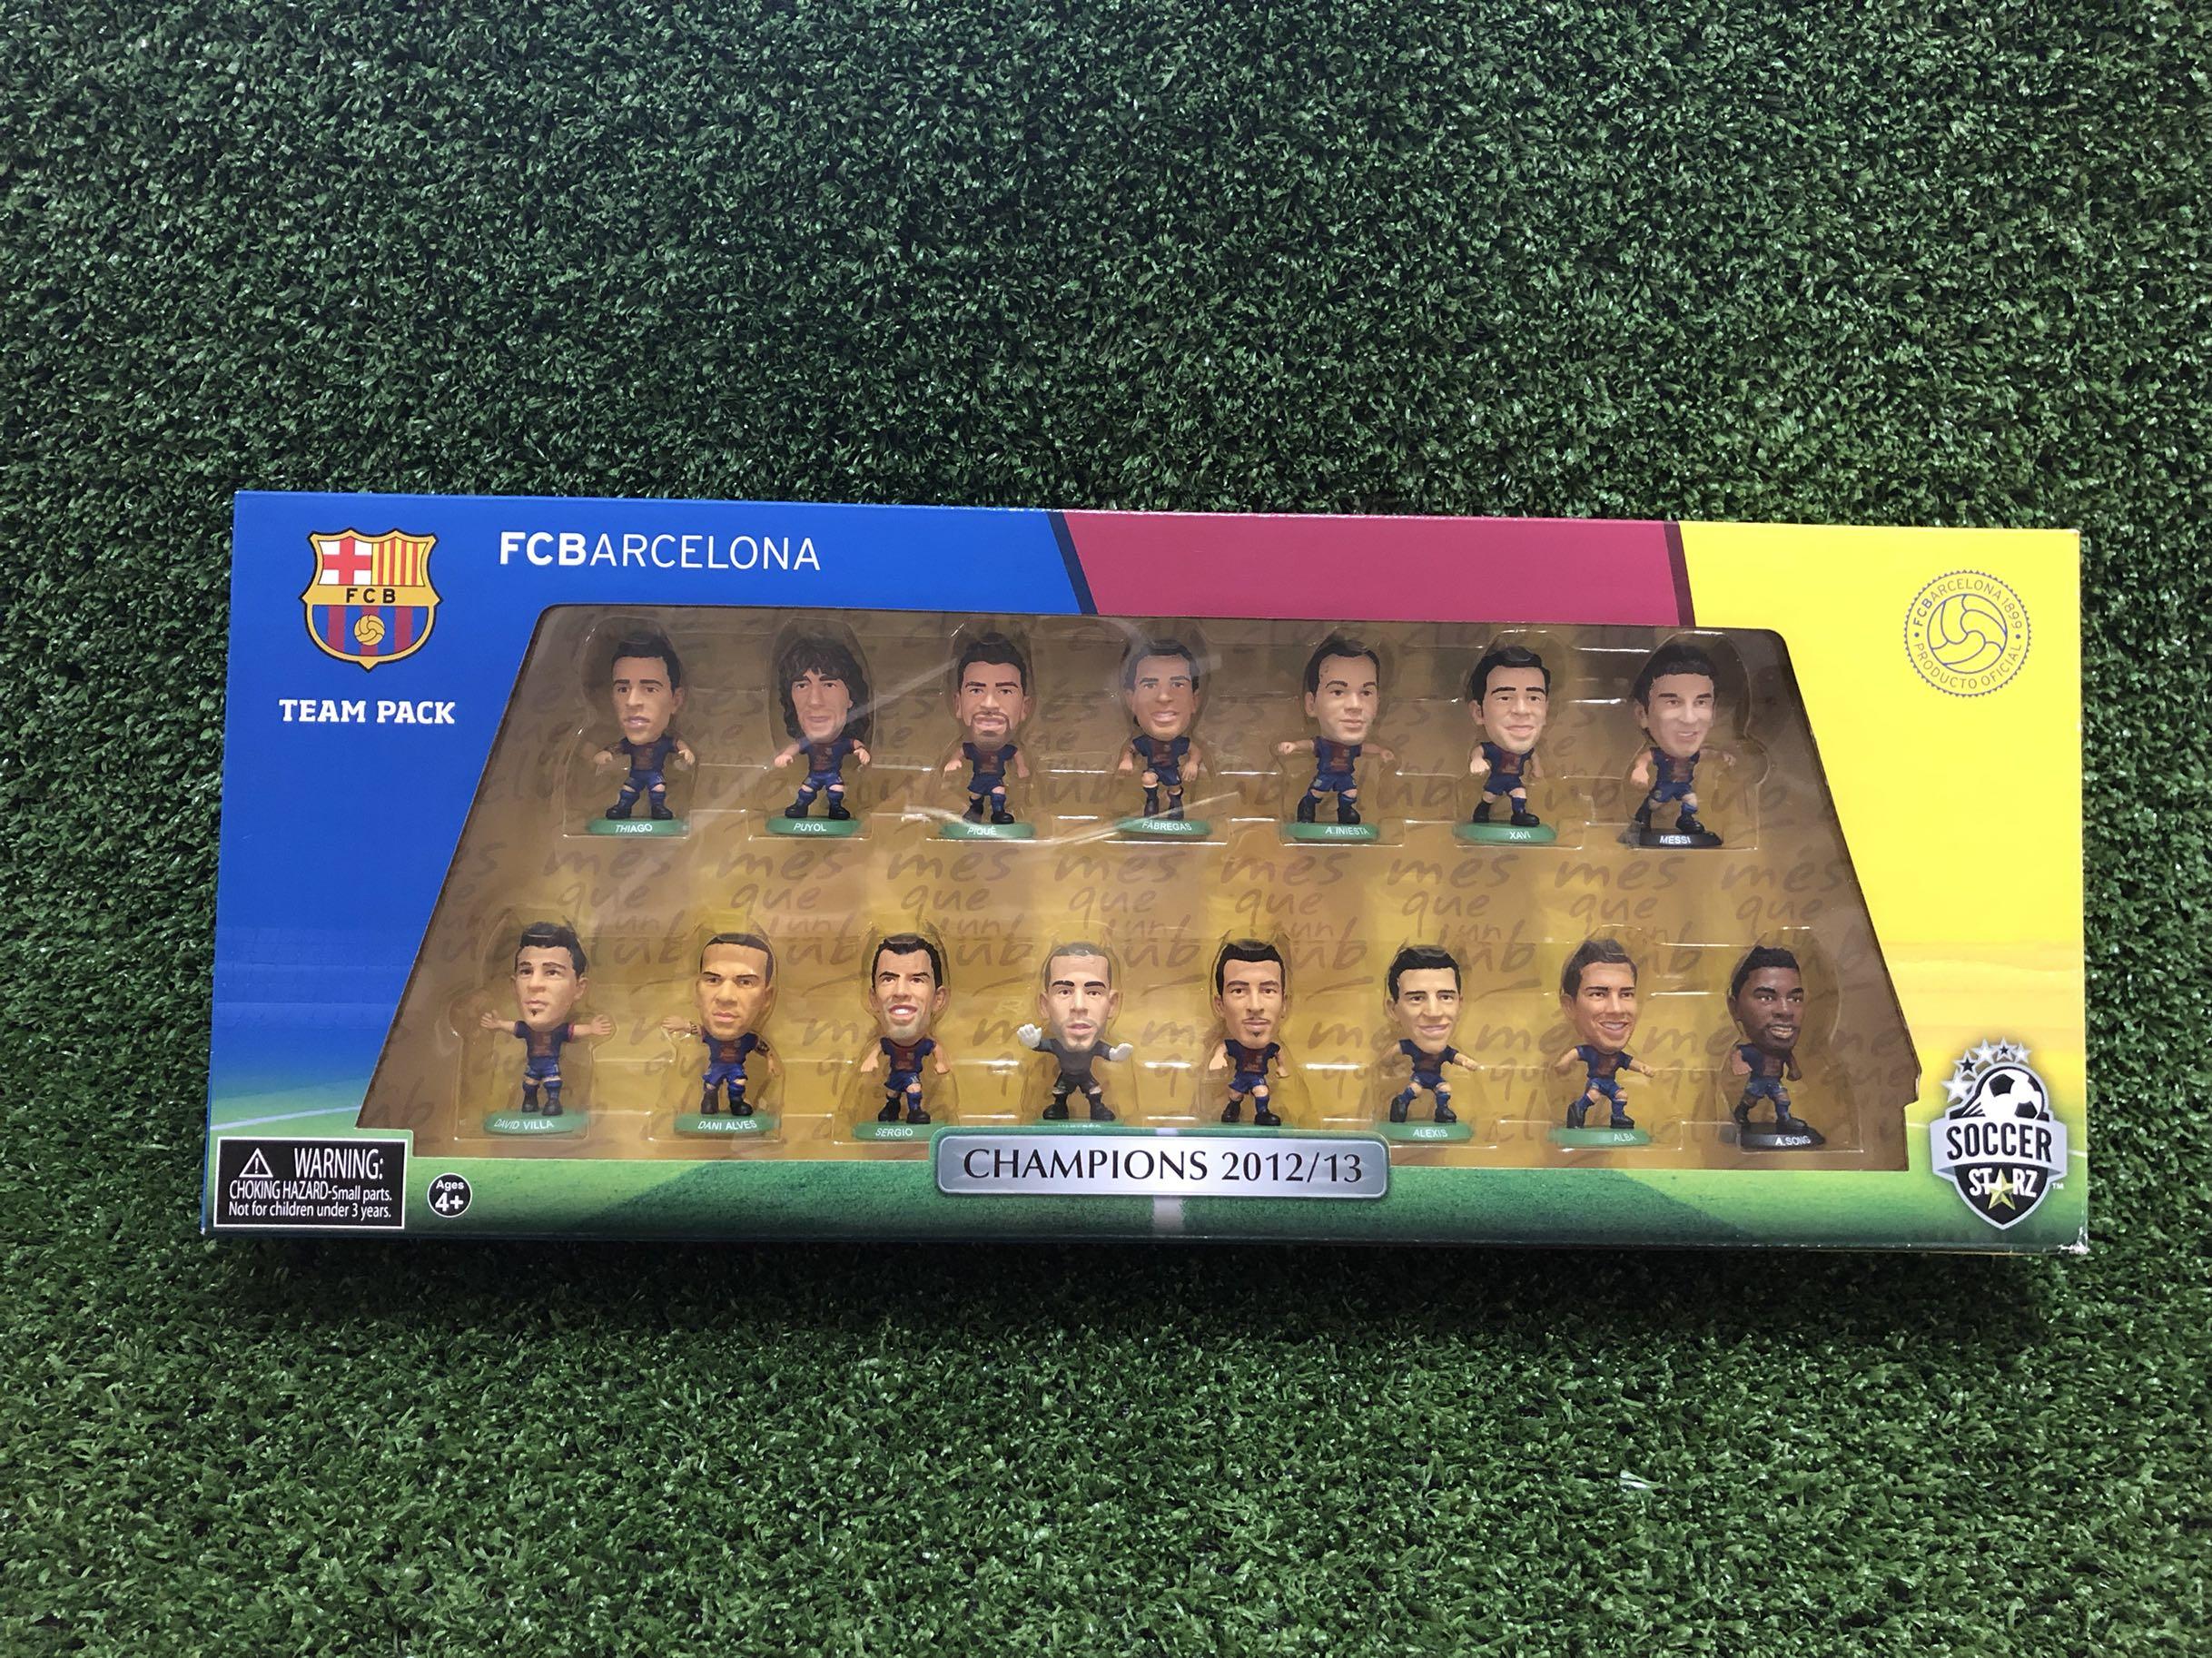 SoccerStarz FC 바르셀로나 축구 피규어 244 : 호줄박